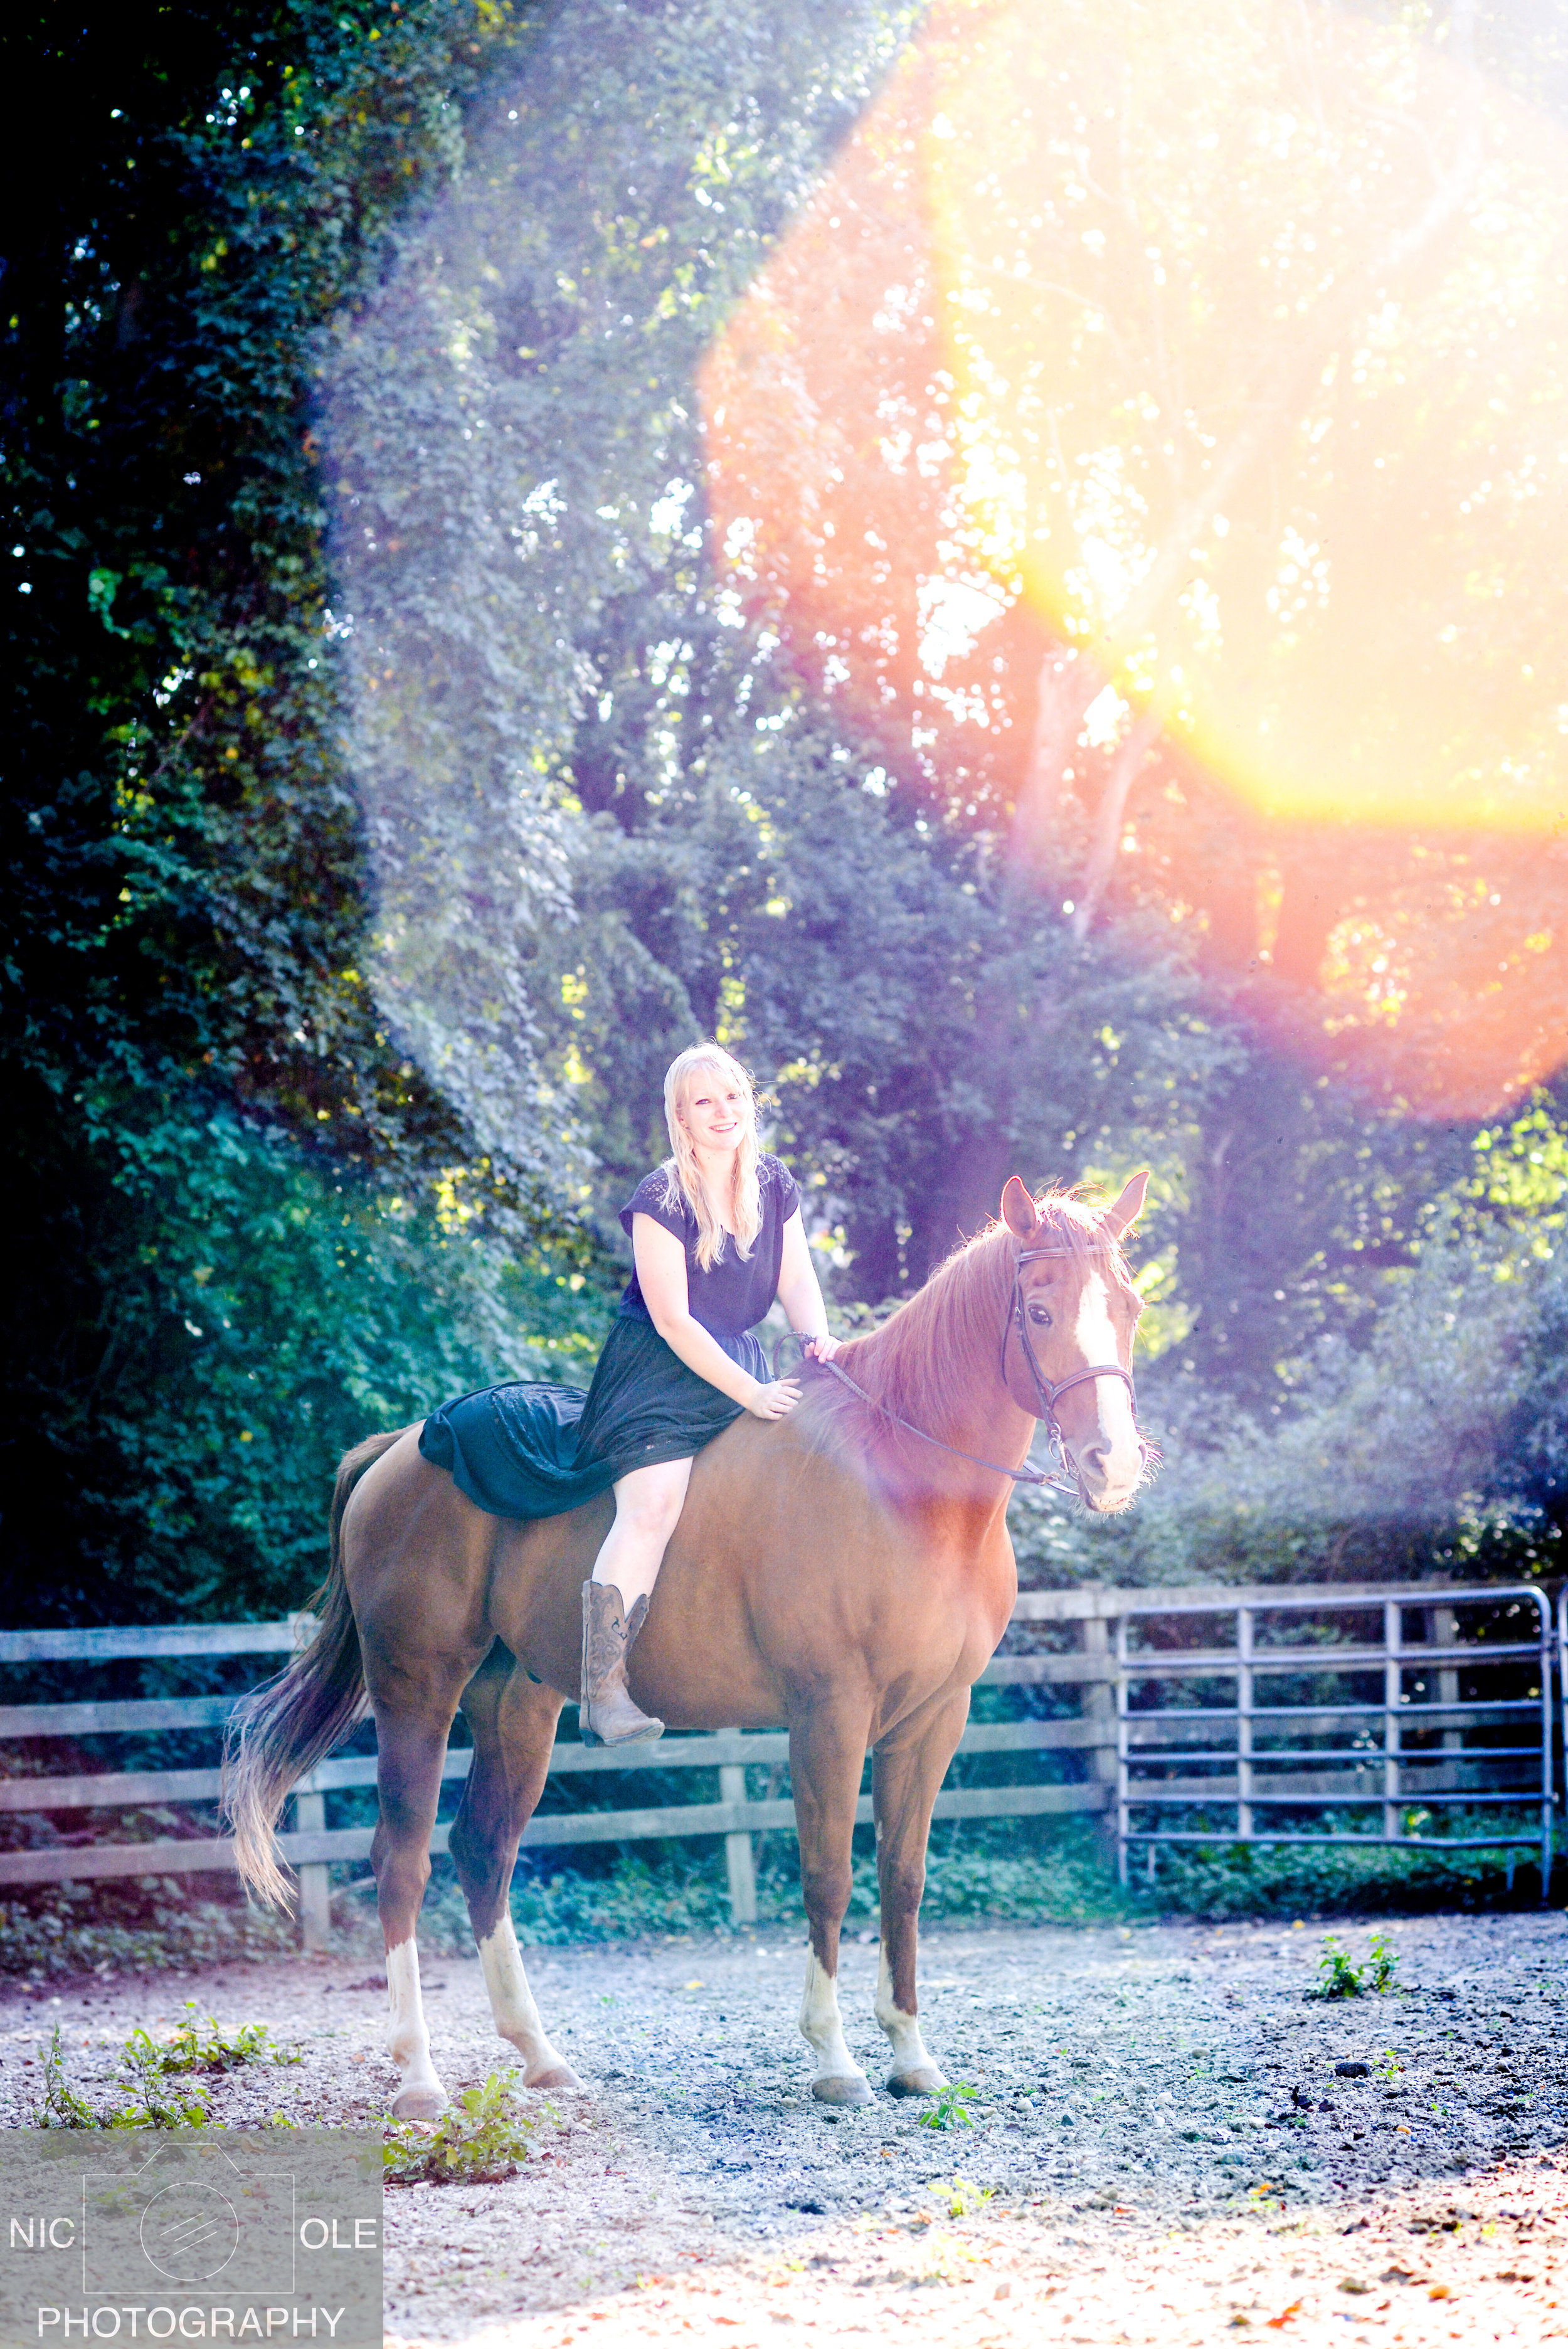 Erica & Albert 10.4.17-NIC.OLE Photography -13.jpg